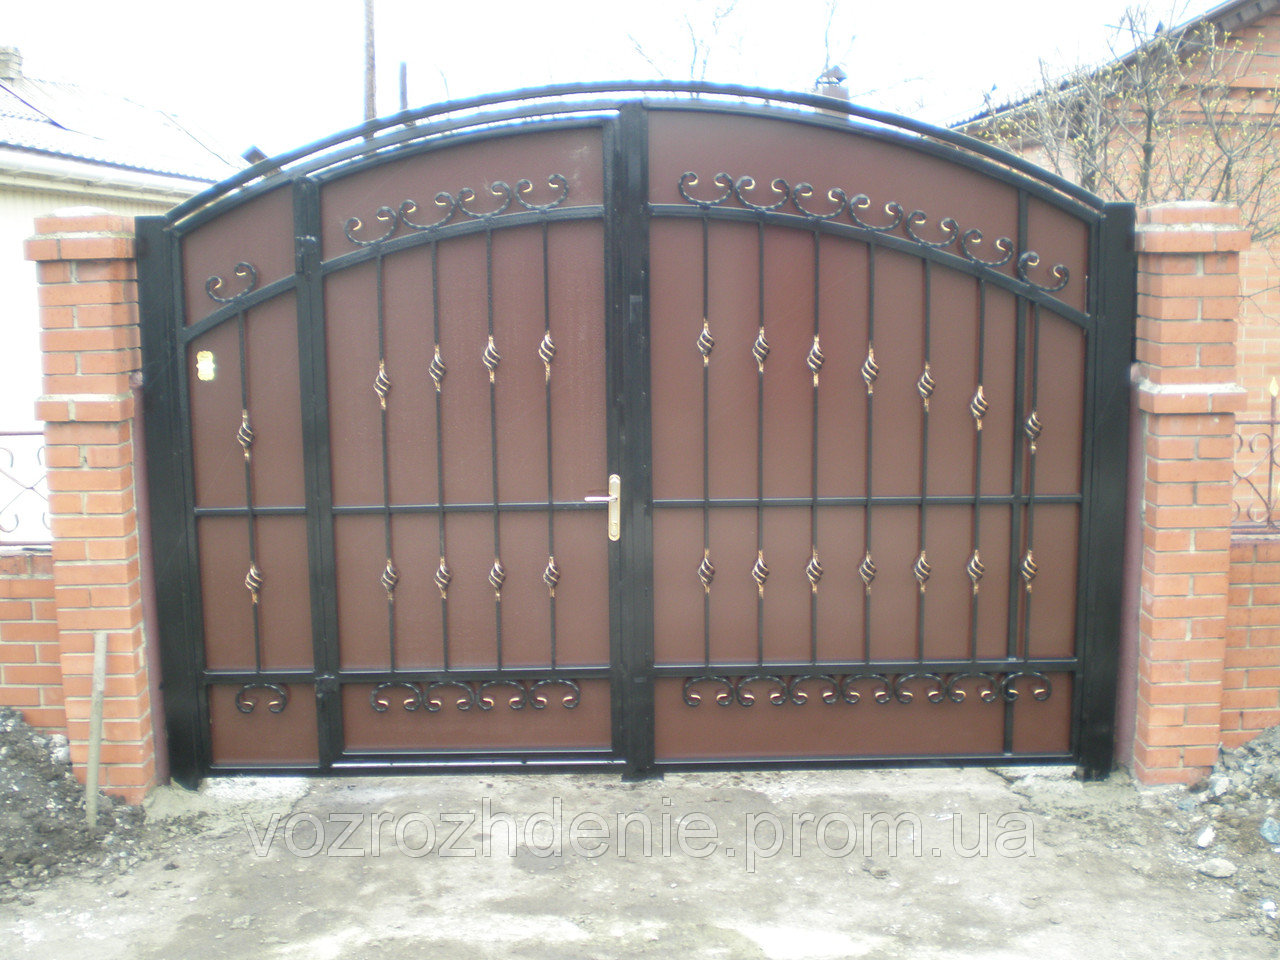 Ворота ковка + композит M120K